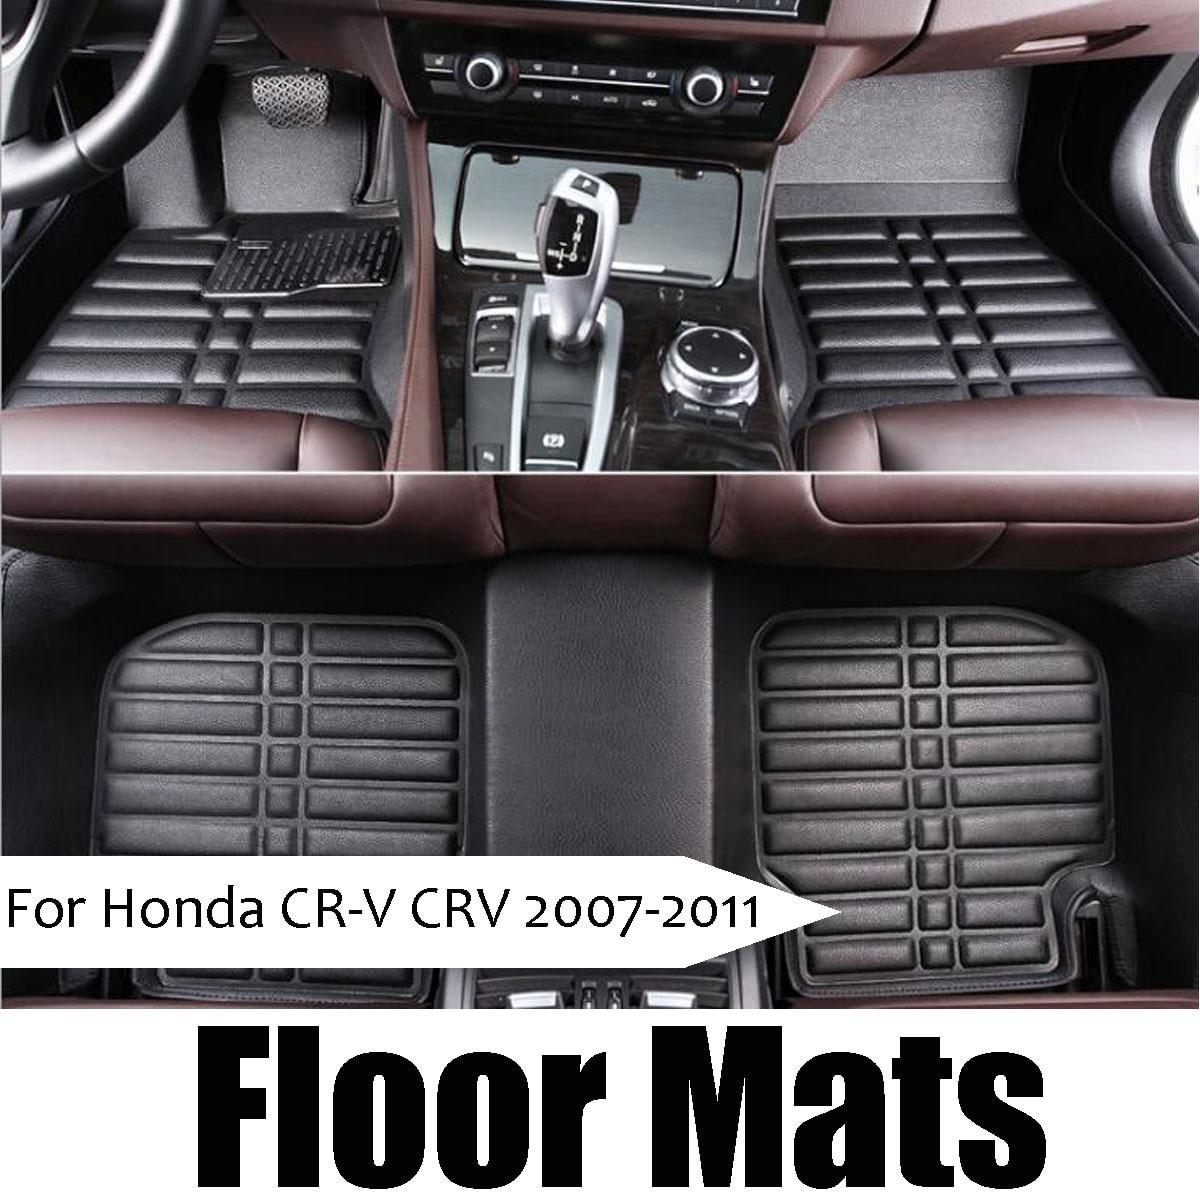 Fit For Honda Accord 2016-2017 Floor Mats Floor Liner Carpets Waterproof Fly5D